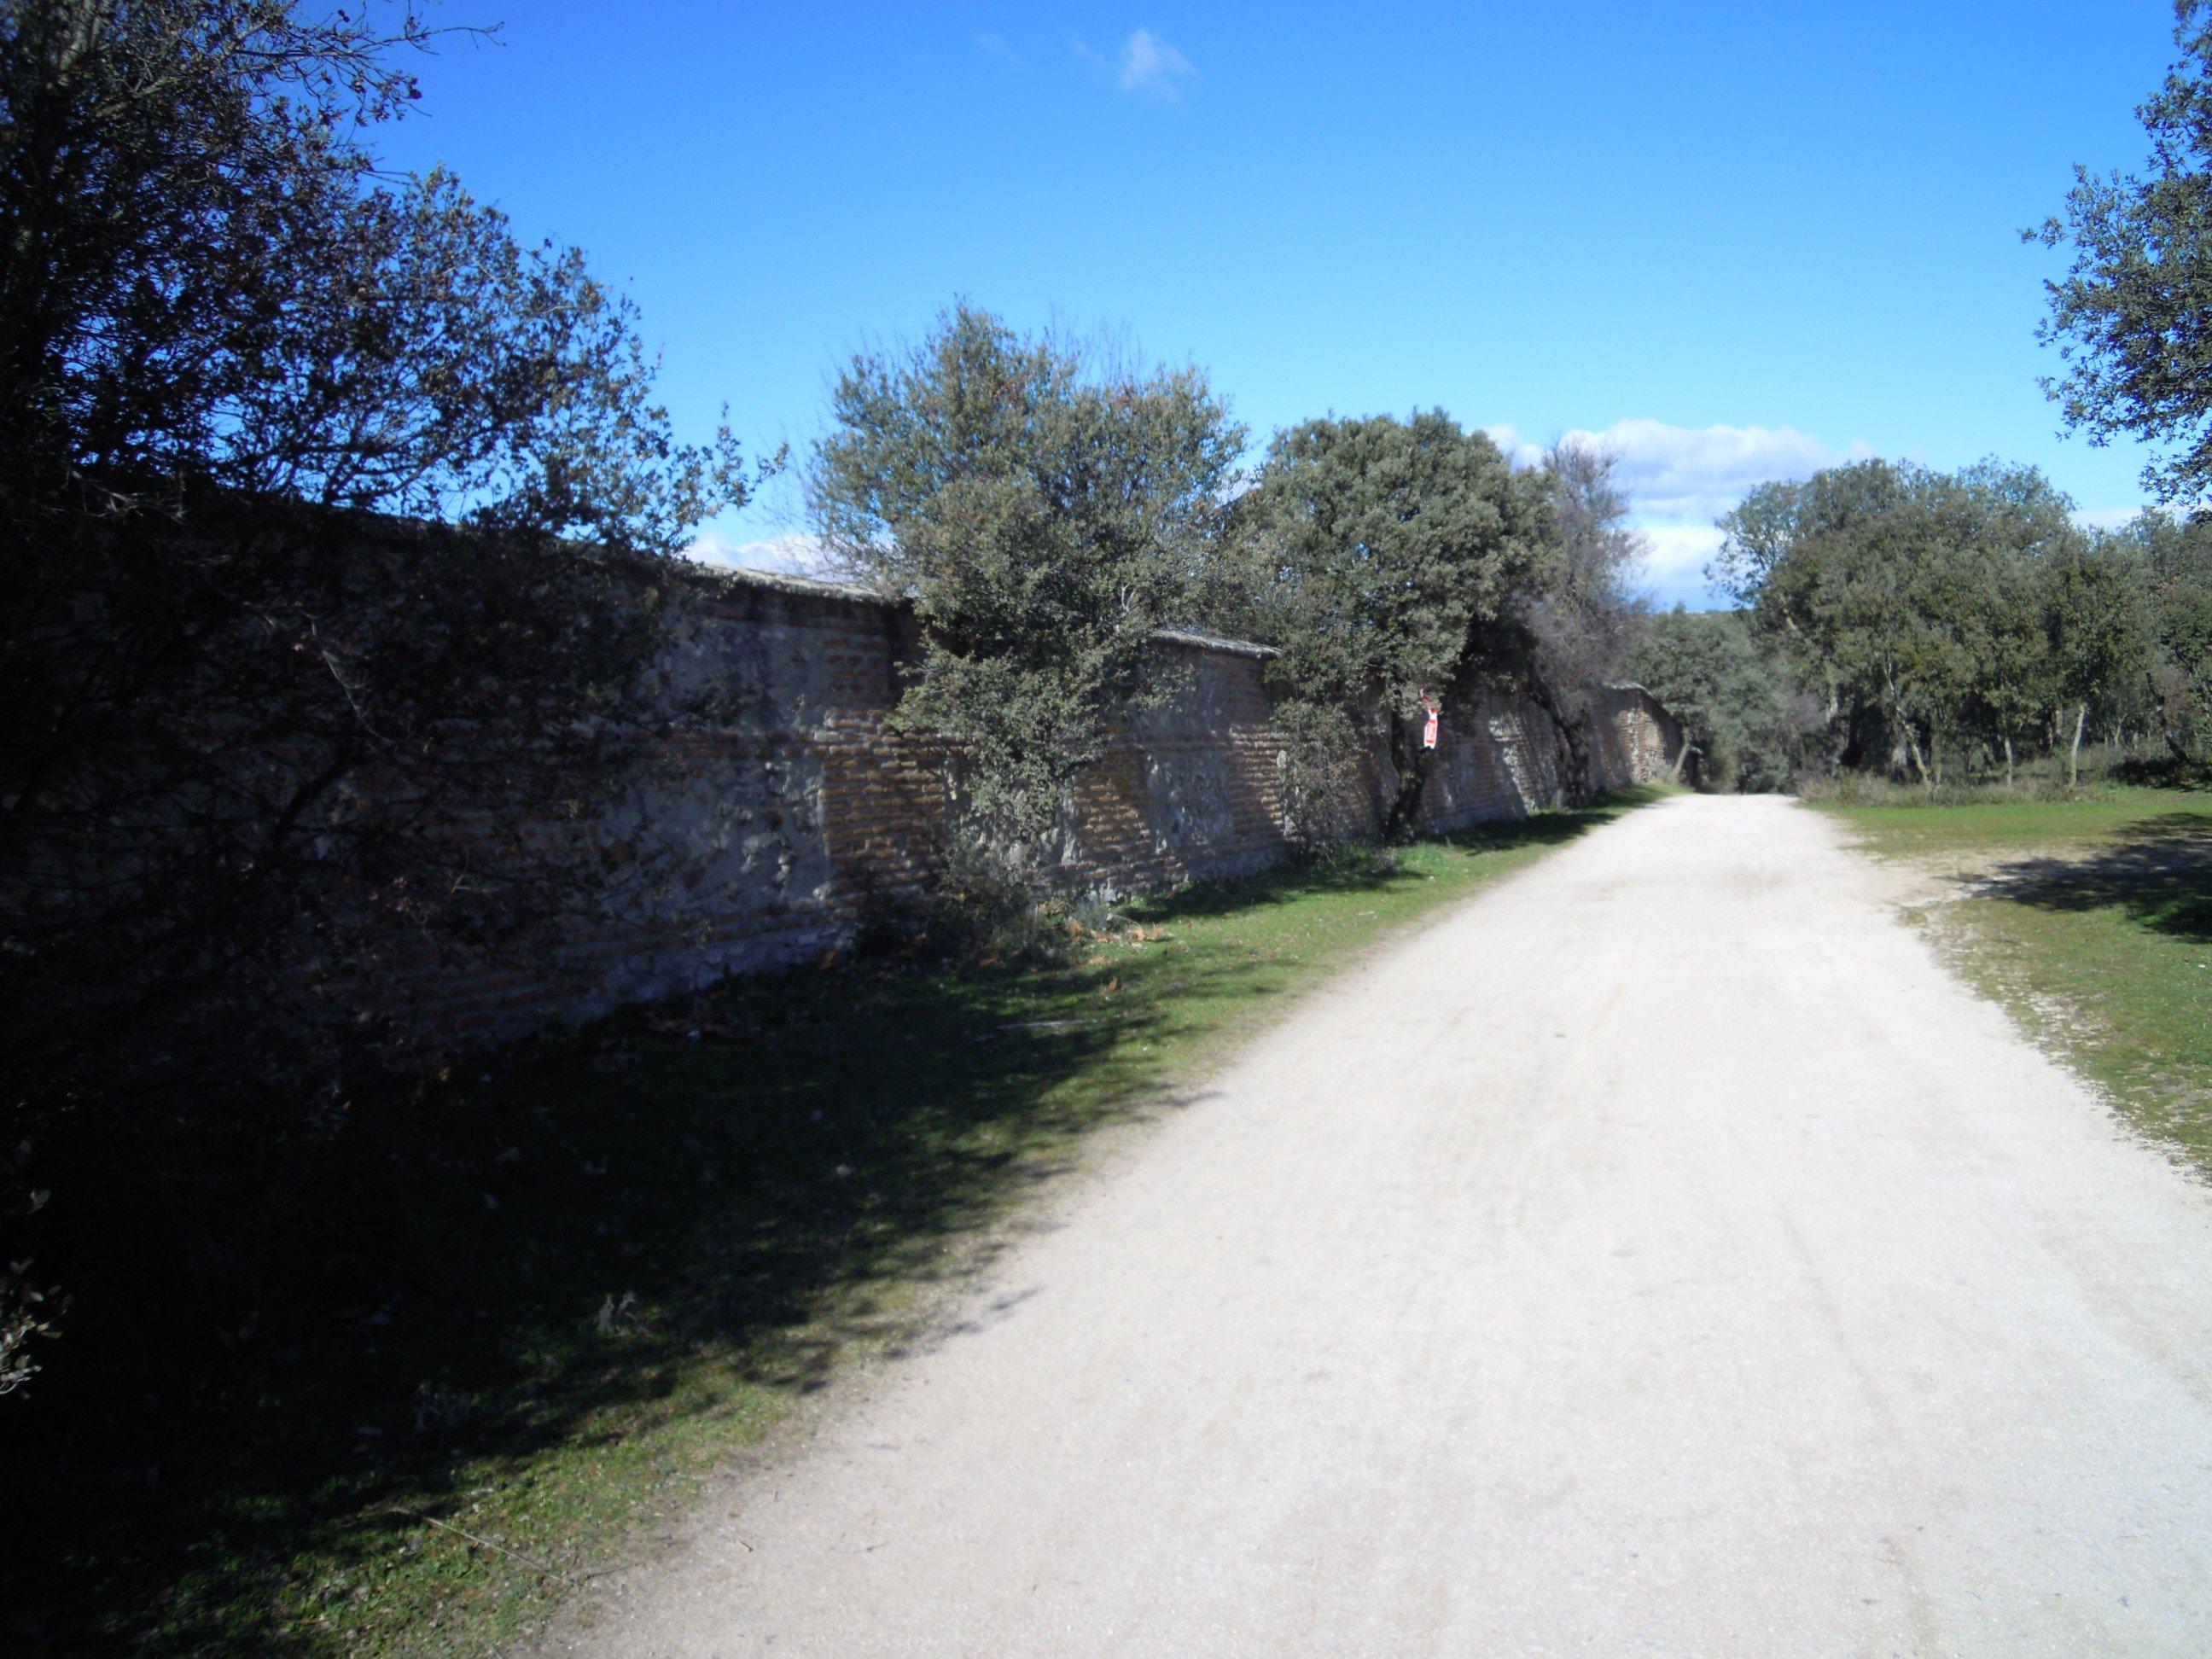 Ruta-Bordeando-tapia-casa-campo 3